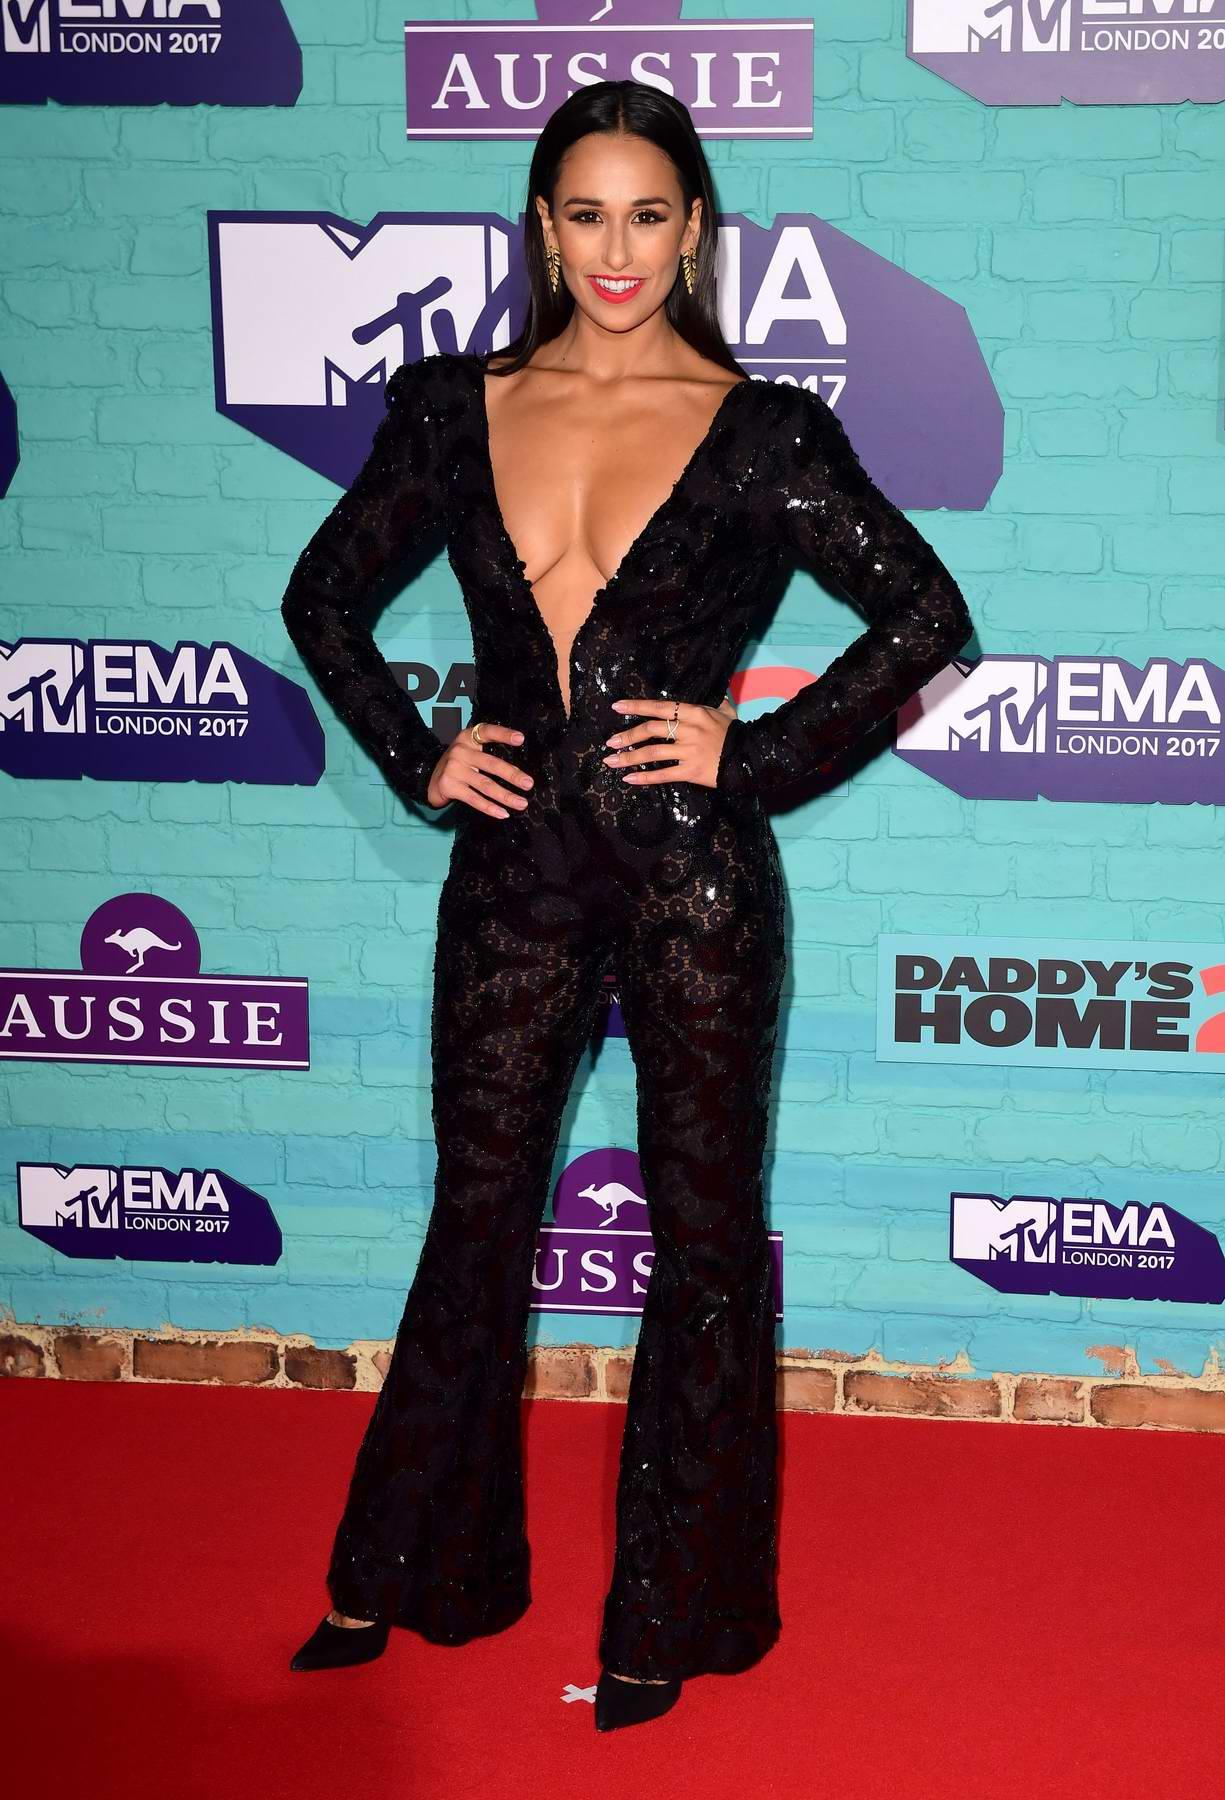 Rita Pereira at the 24th MTV Europe Music Awards held at SSE Arena Wembley in London